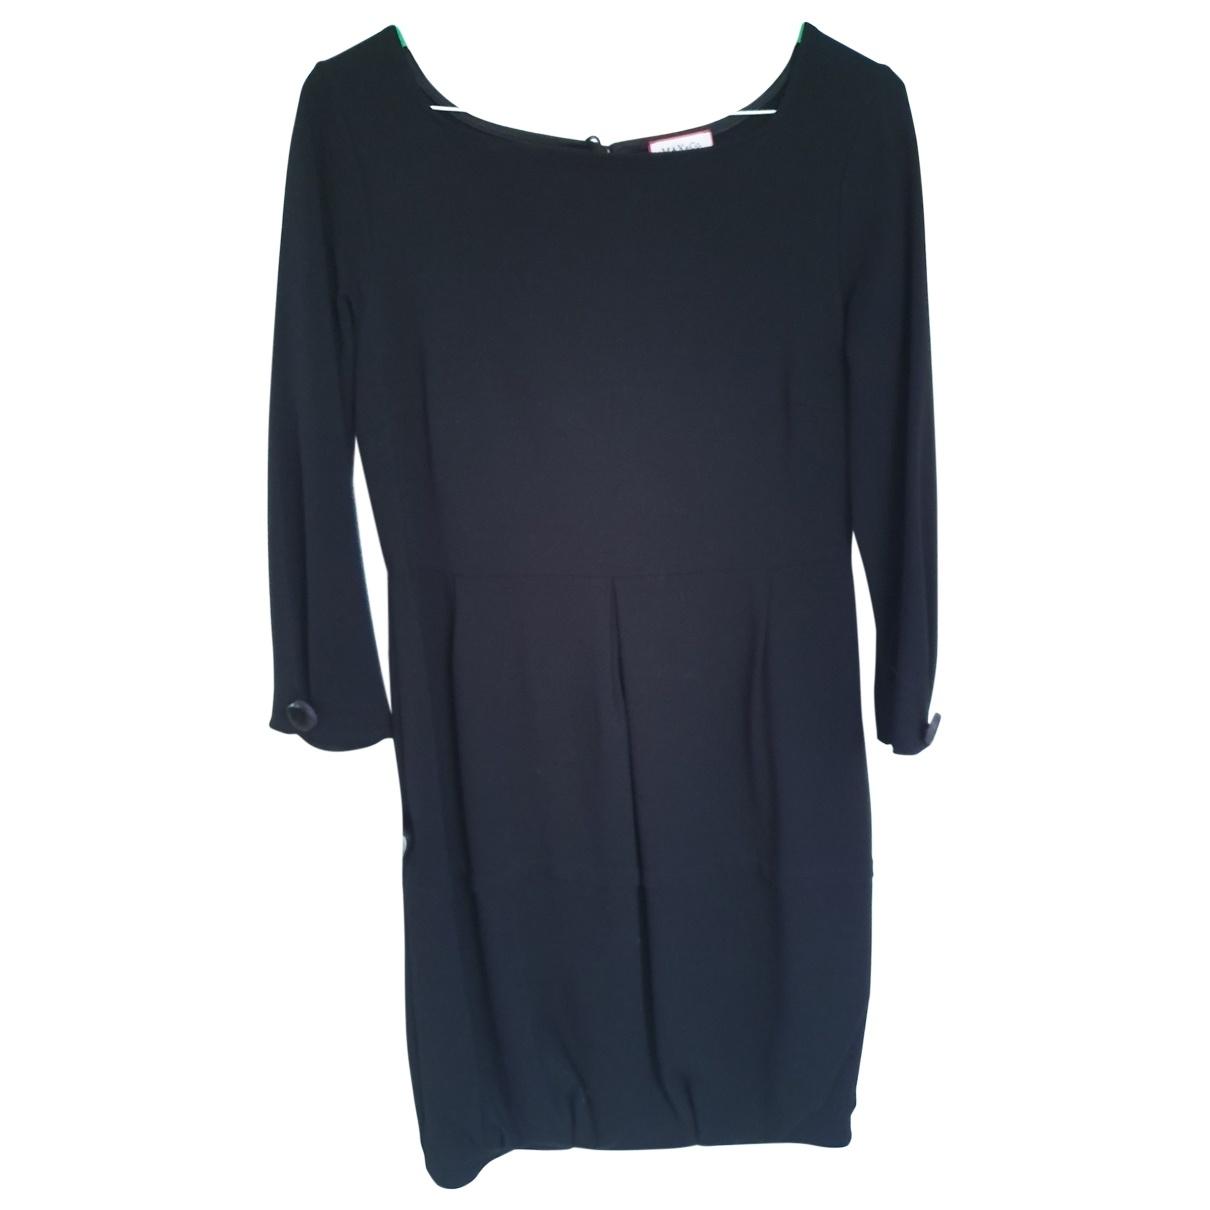 Max & Co \N Black dress for Women M International